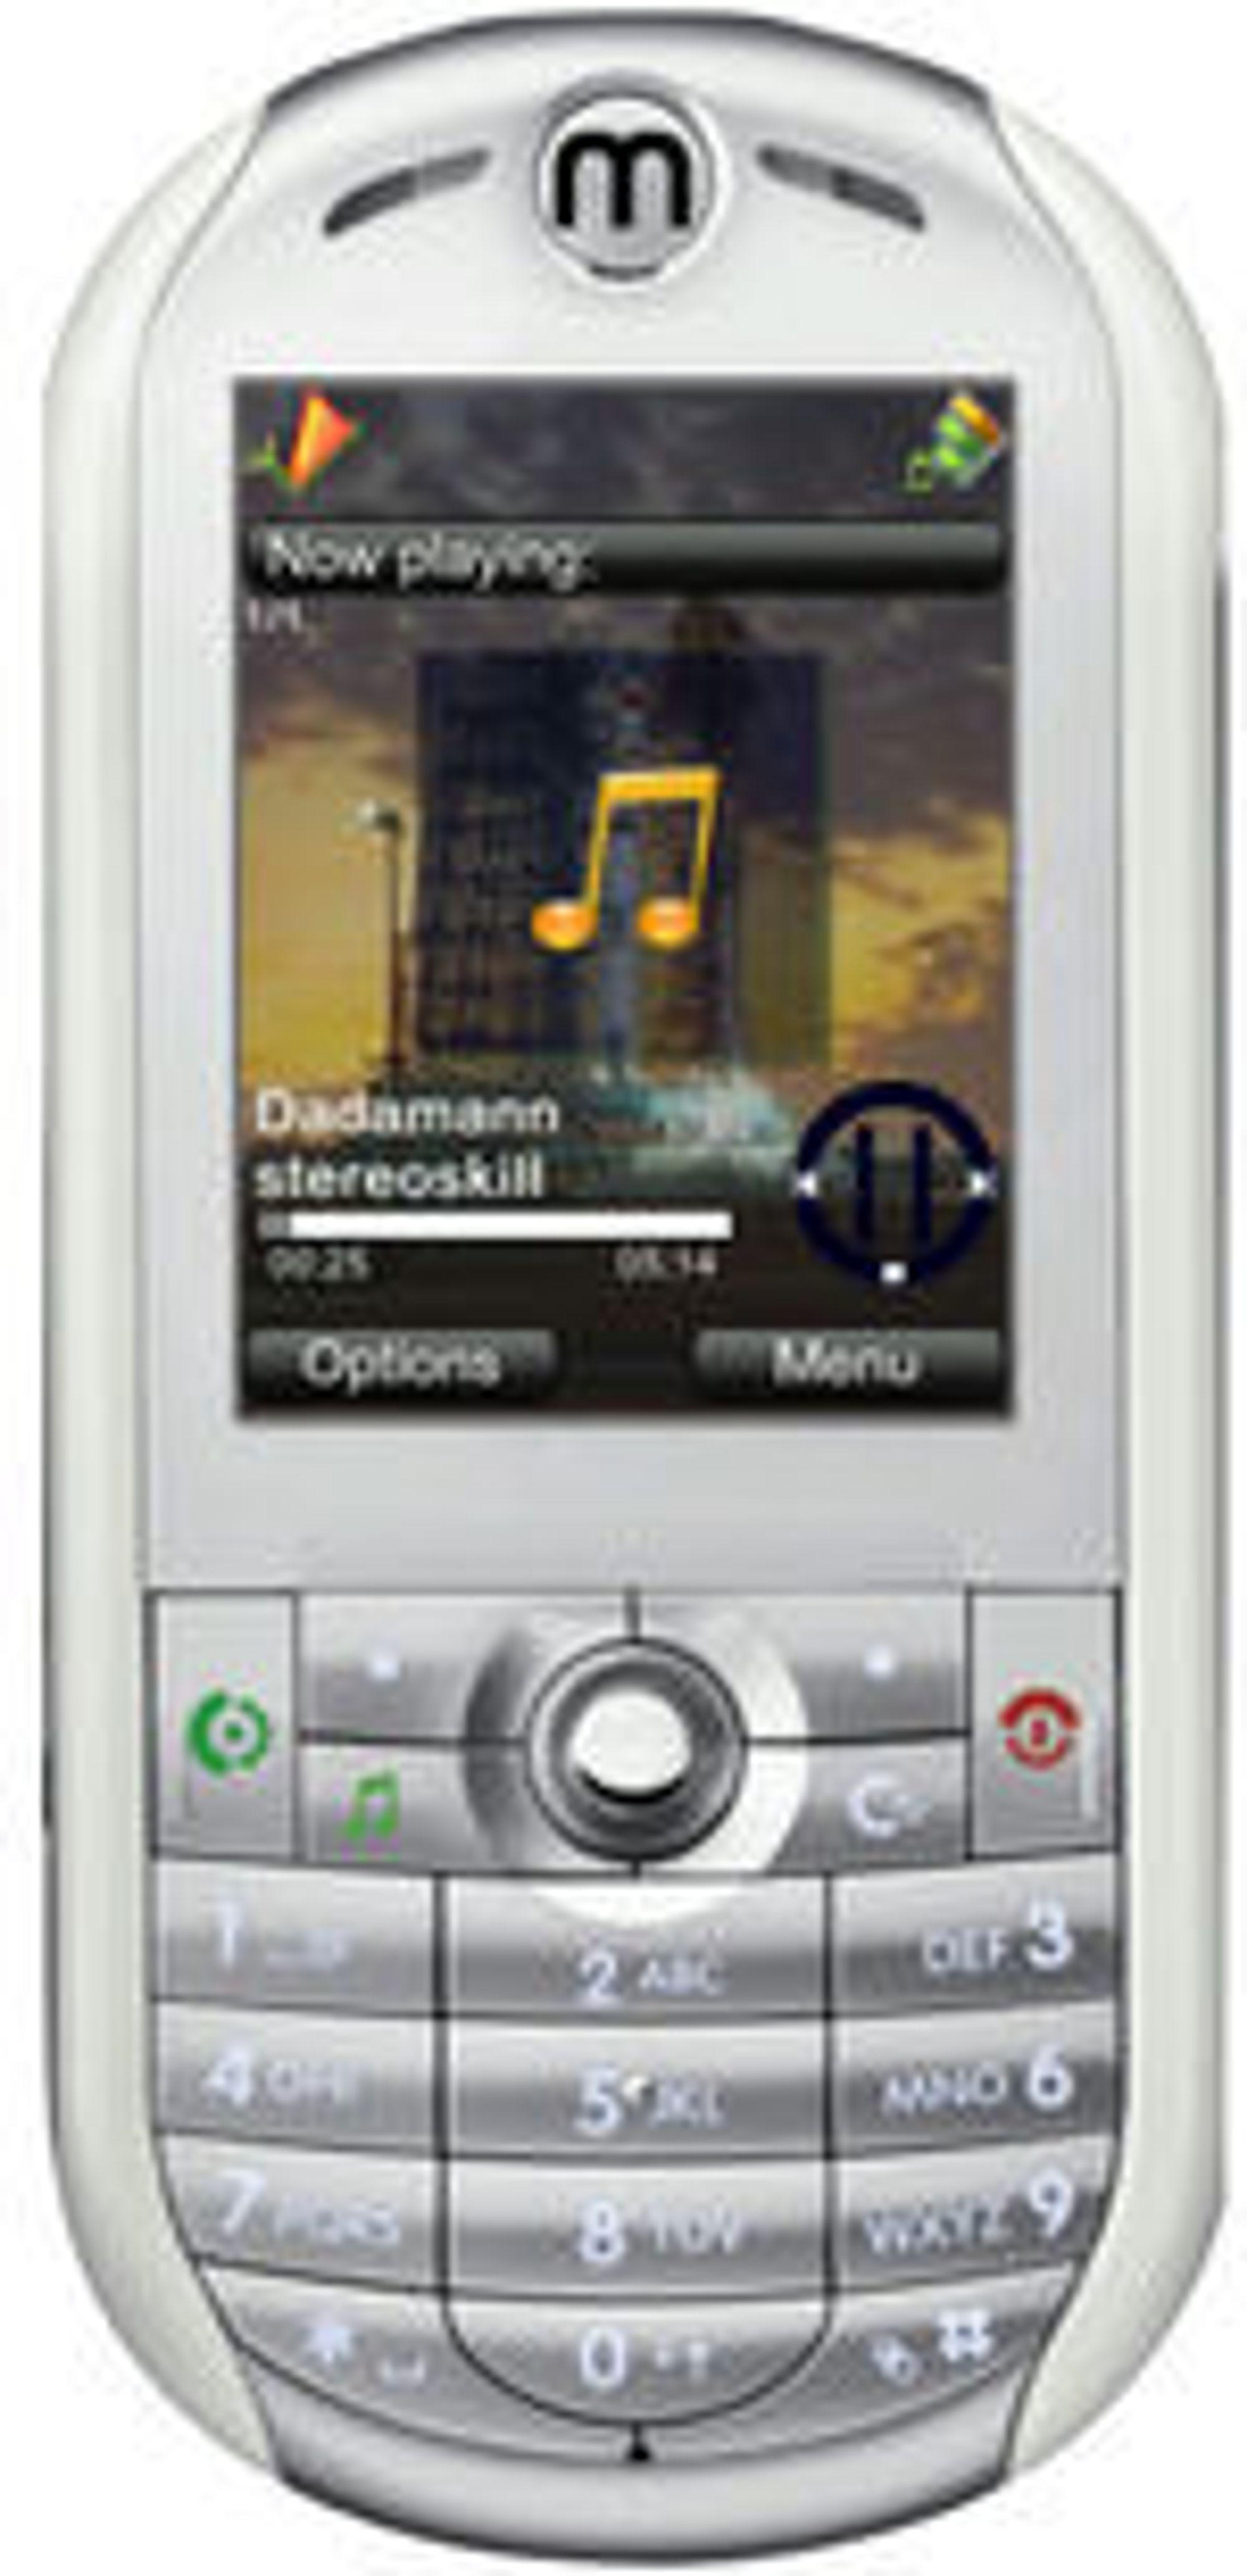 Programvareløsningen Mimria tilpasses ulike mobiltelefoner i feature-klassen.